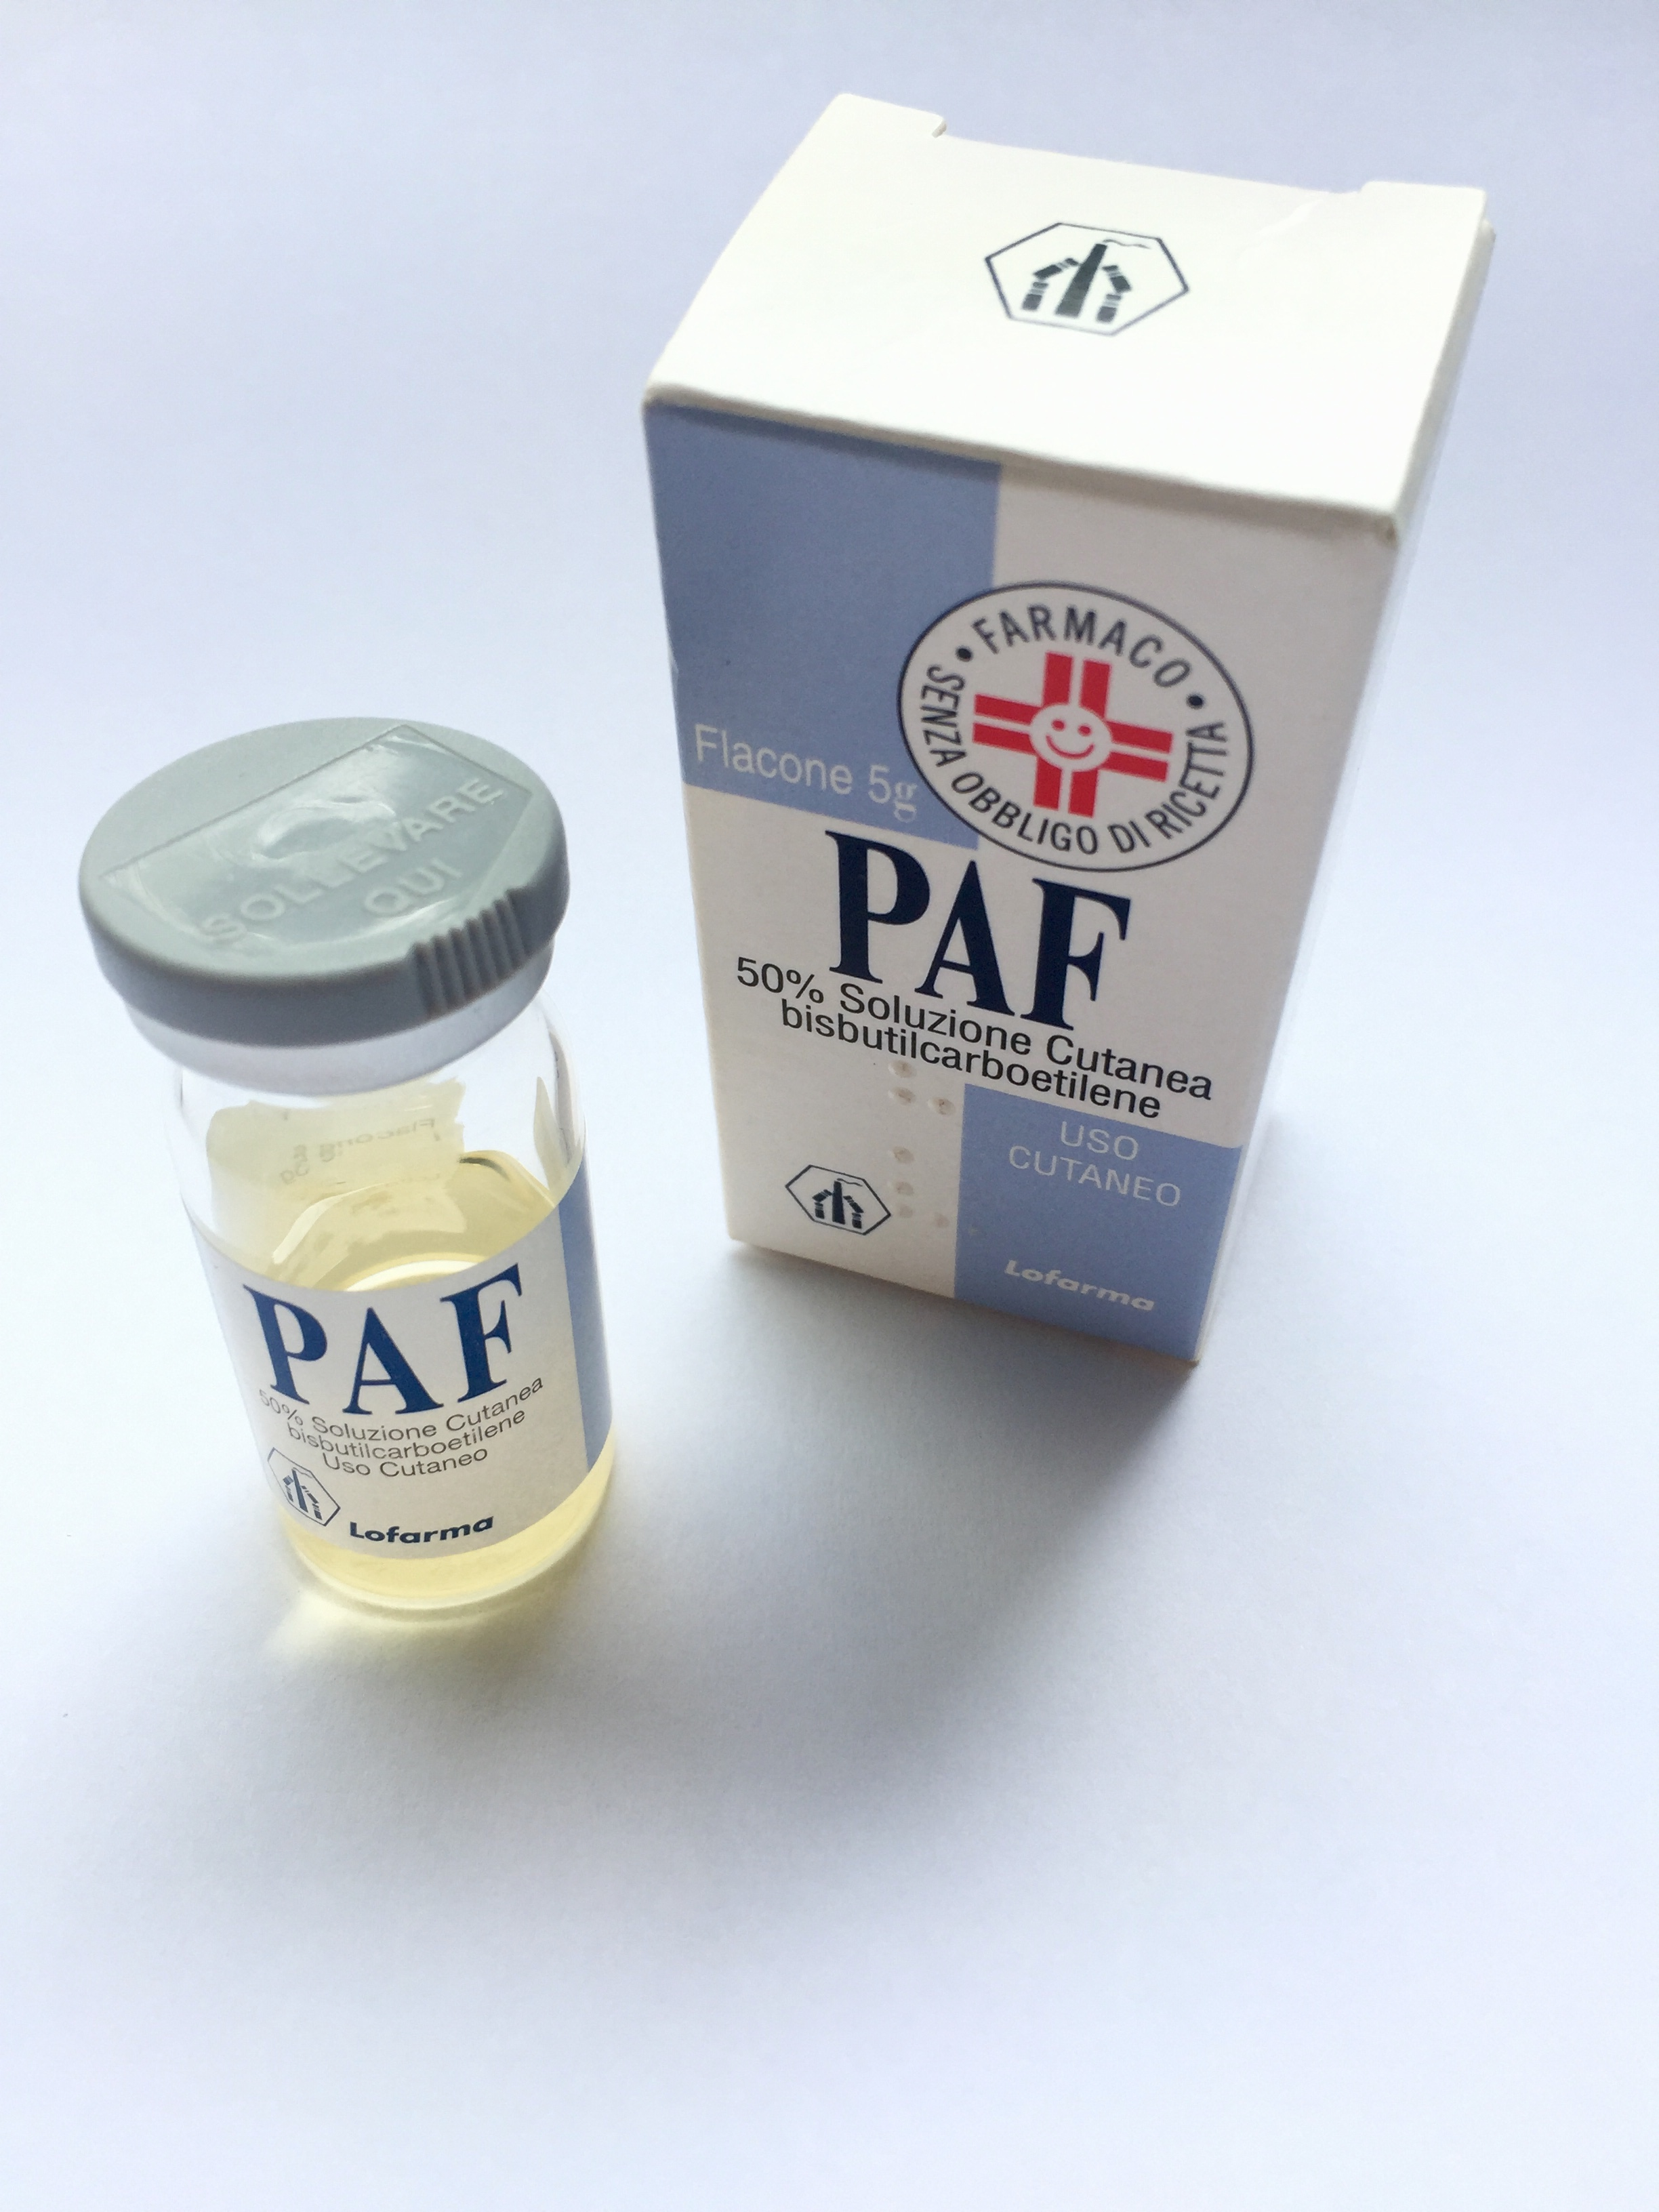 PAF*50% SOL CUT FL 5G offerta